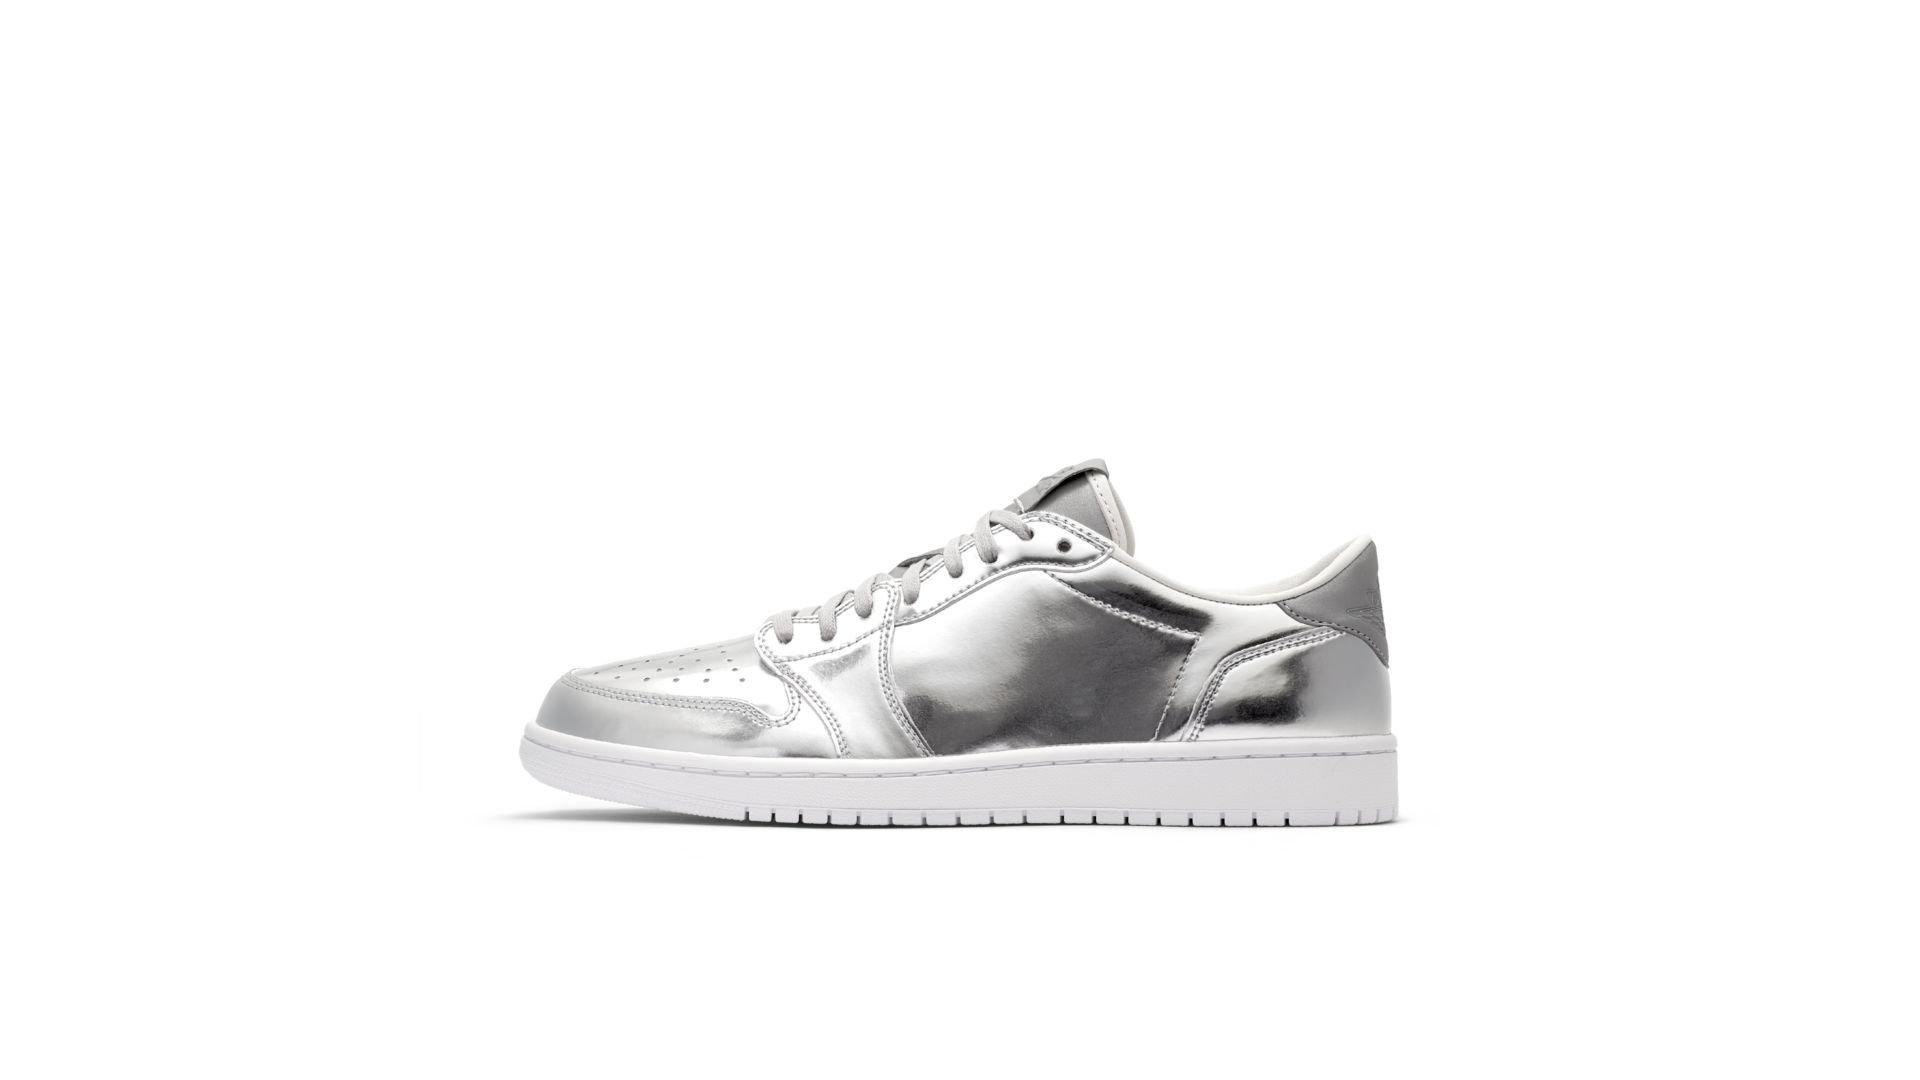 Jordan 1 Retro Low Pinnacle Metallic Silver (852549-003)